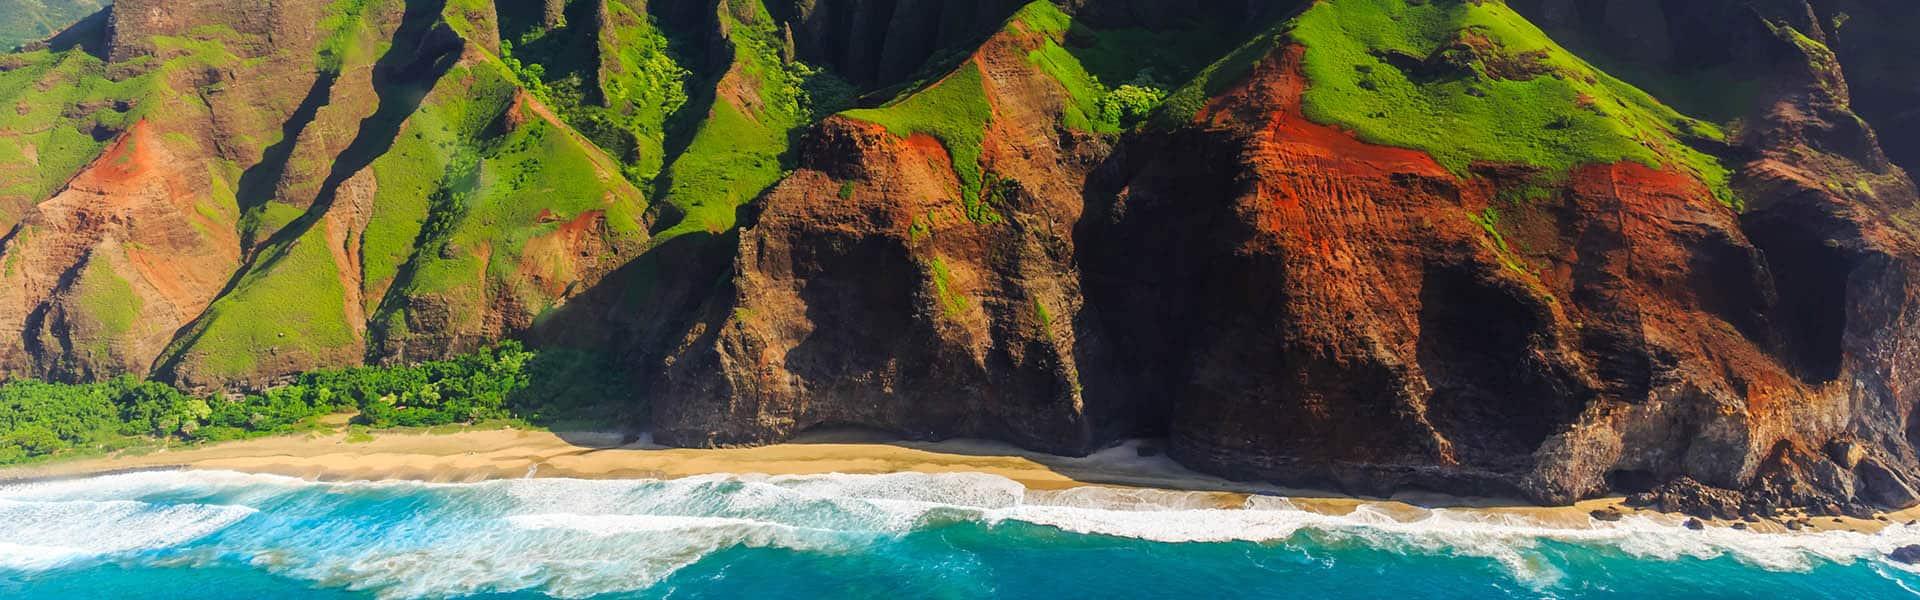 Südpazifik: Bora Bora, Kauaiund Maui nach Honolulu